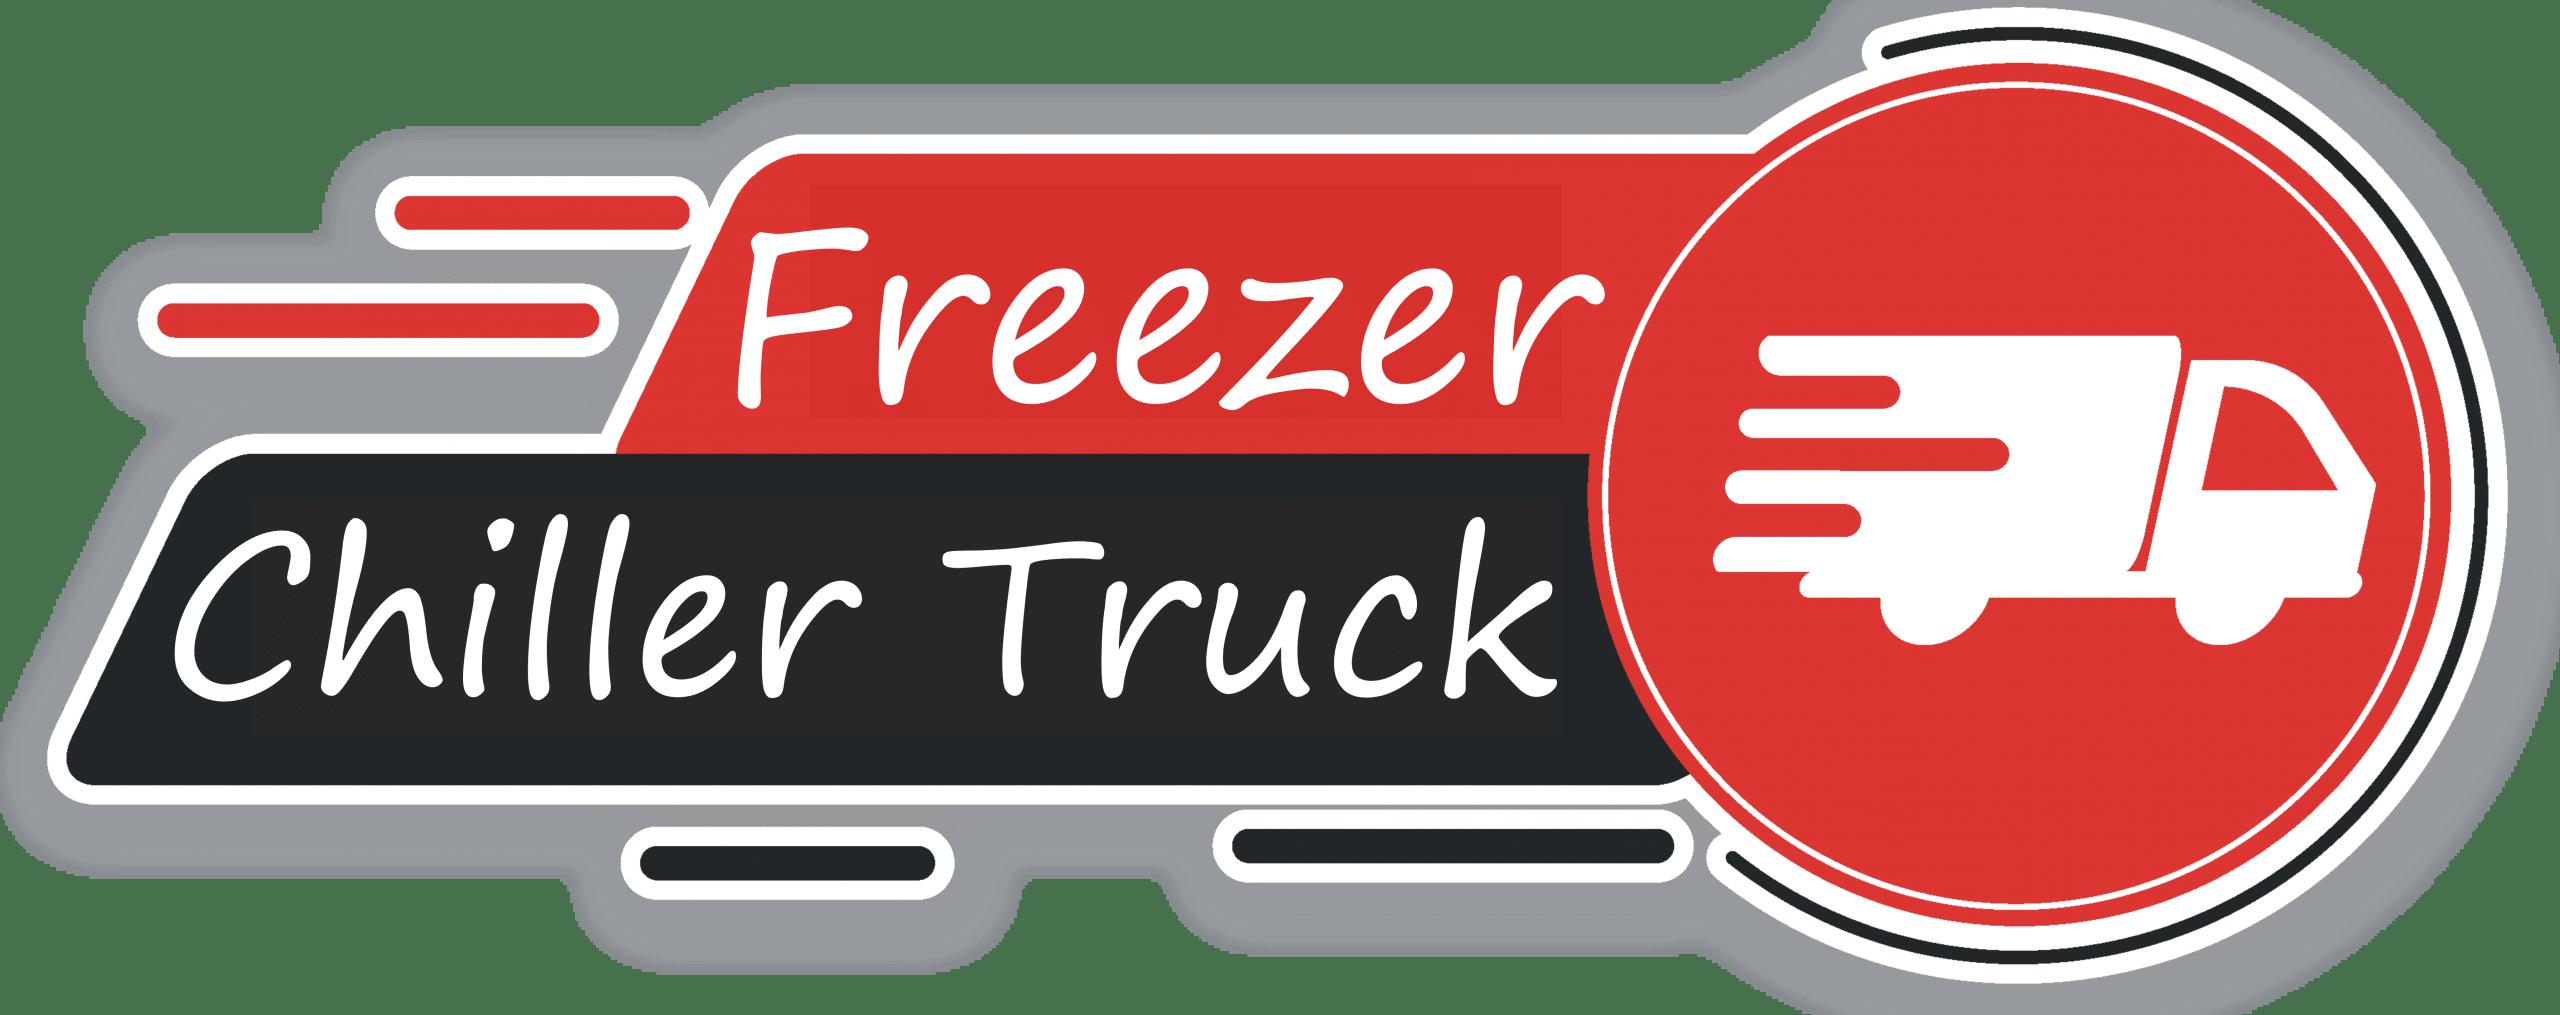 Freezer Chiller Truck